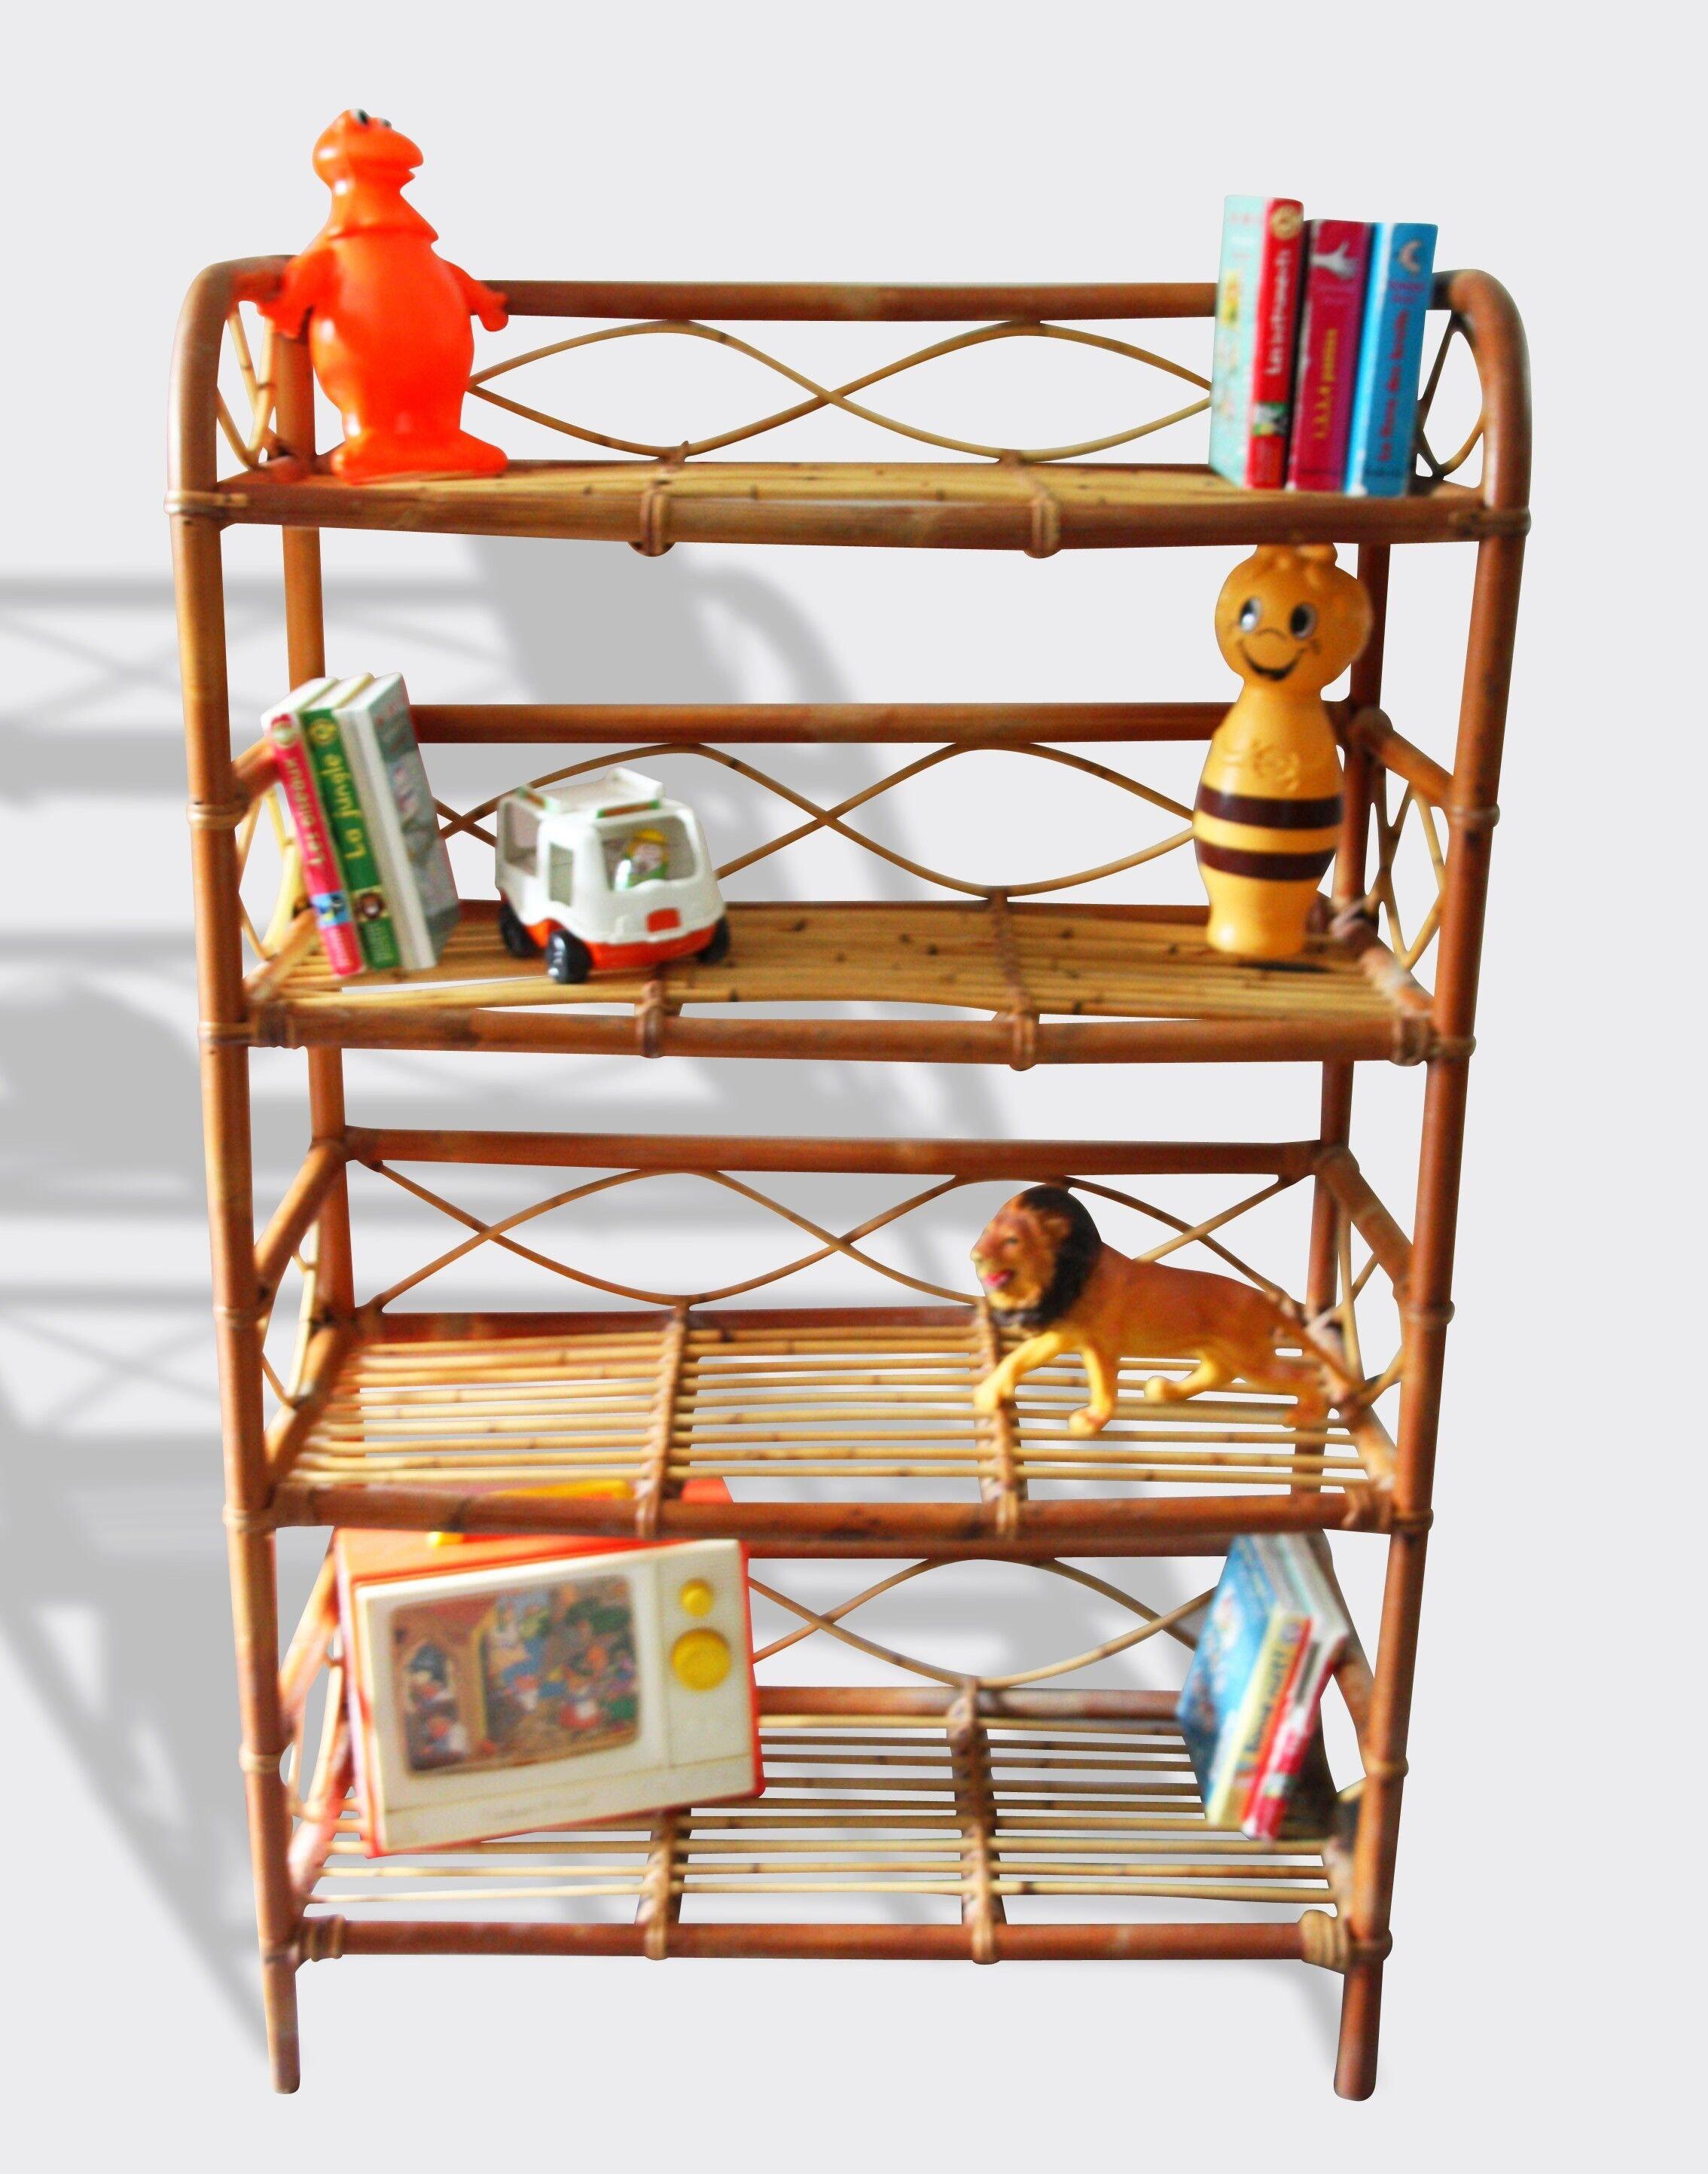 bibliotheque osier. Black Bedroom Furniture Sets. Home Design Ideas